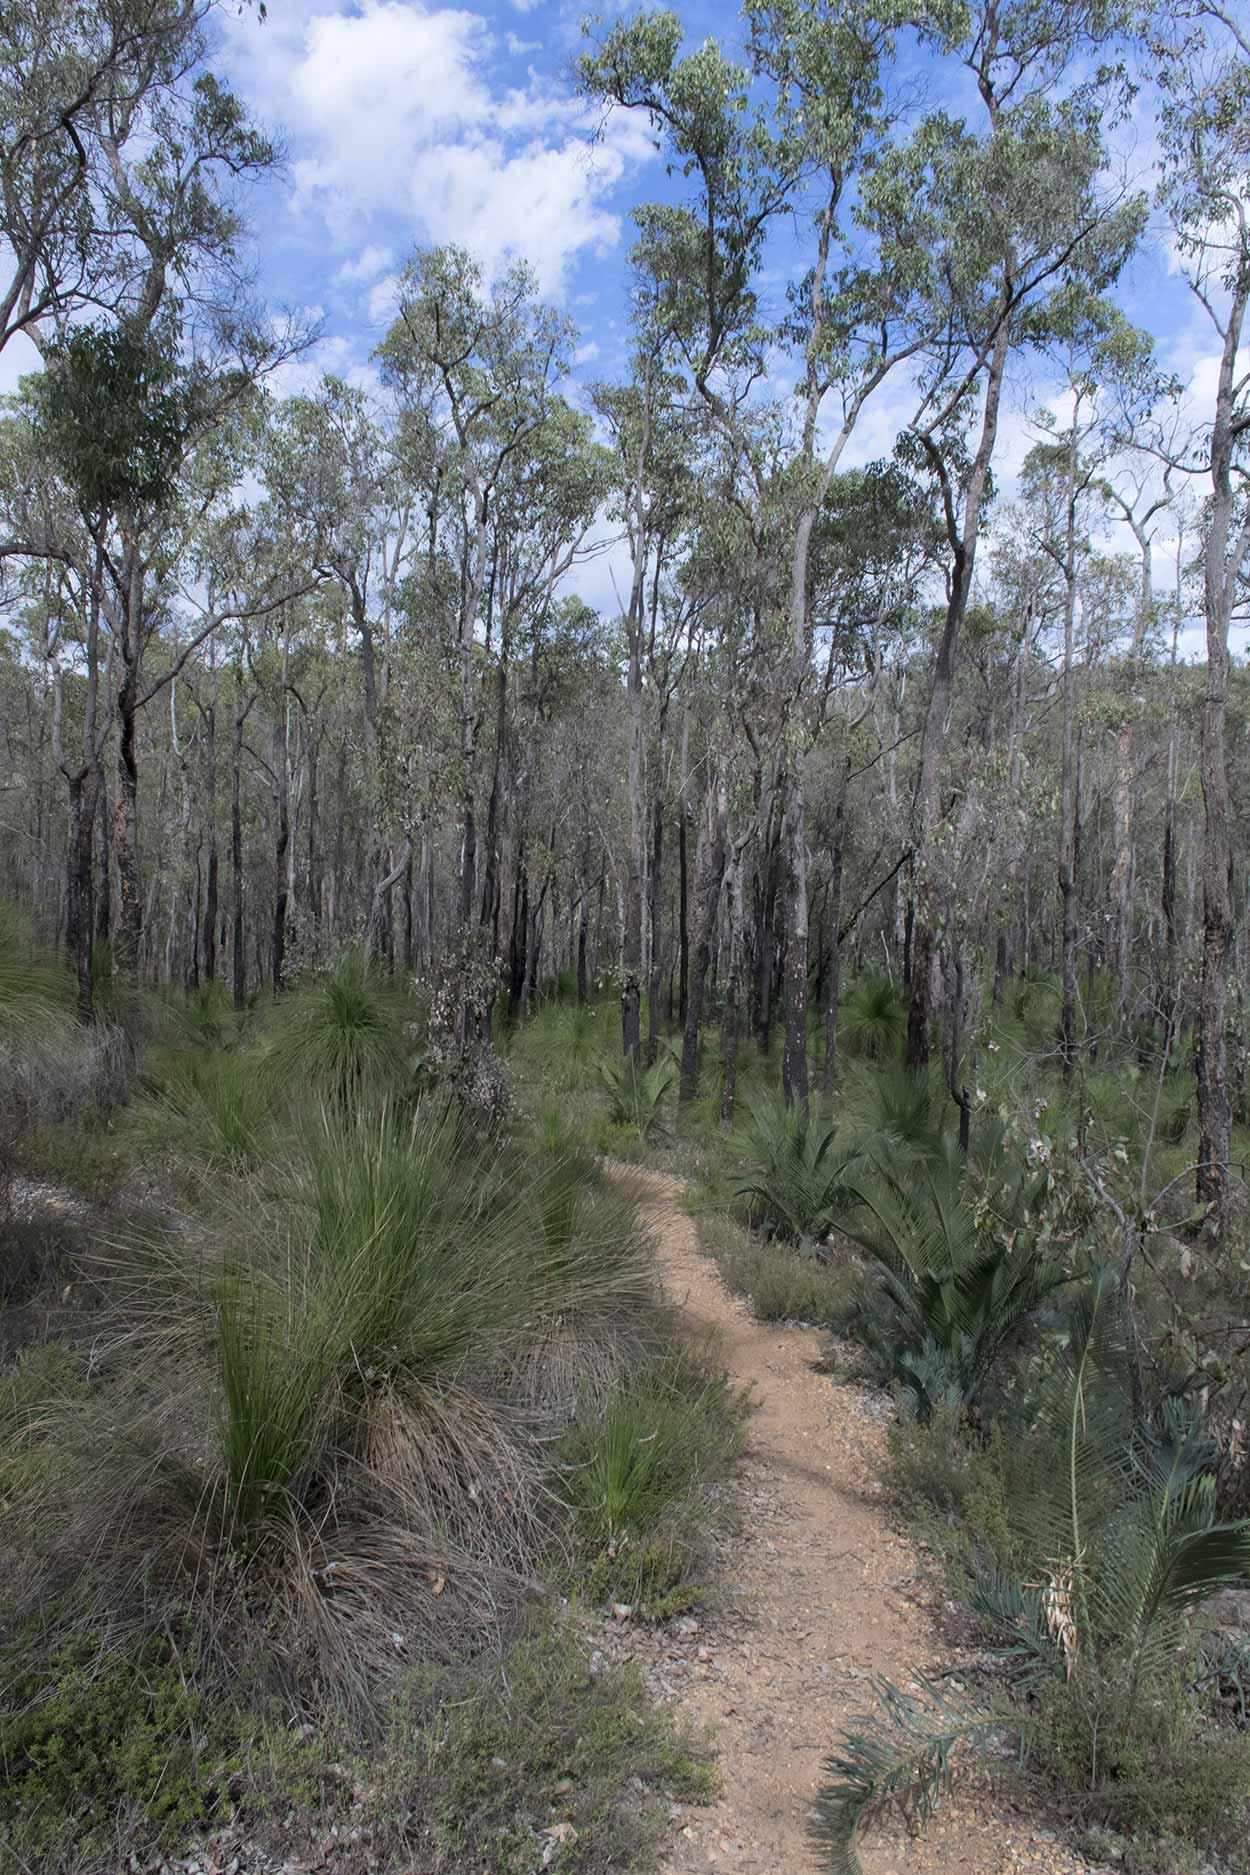 Bushland, Bibbulmun Track, Perth, Western Australia